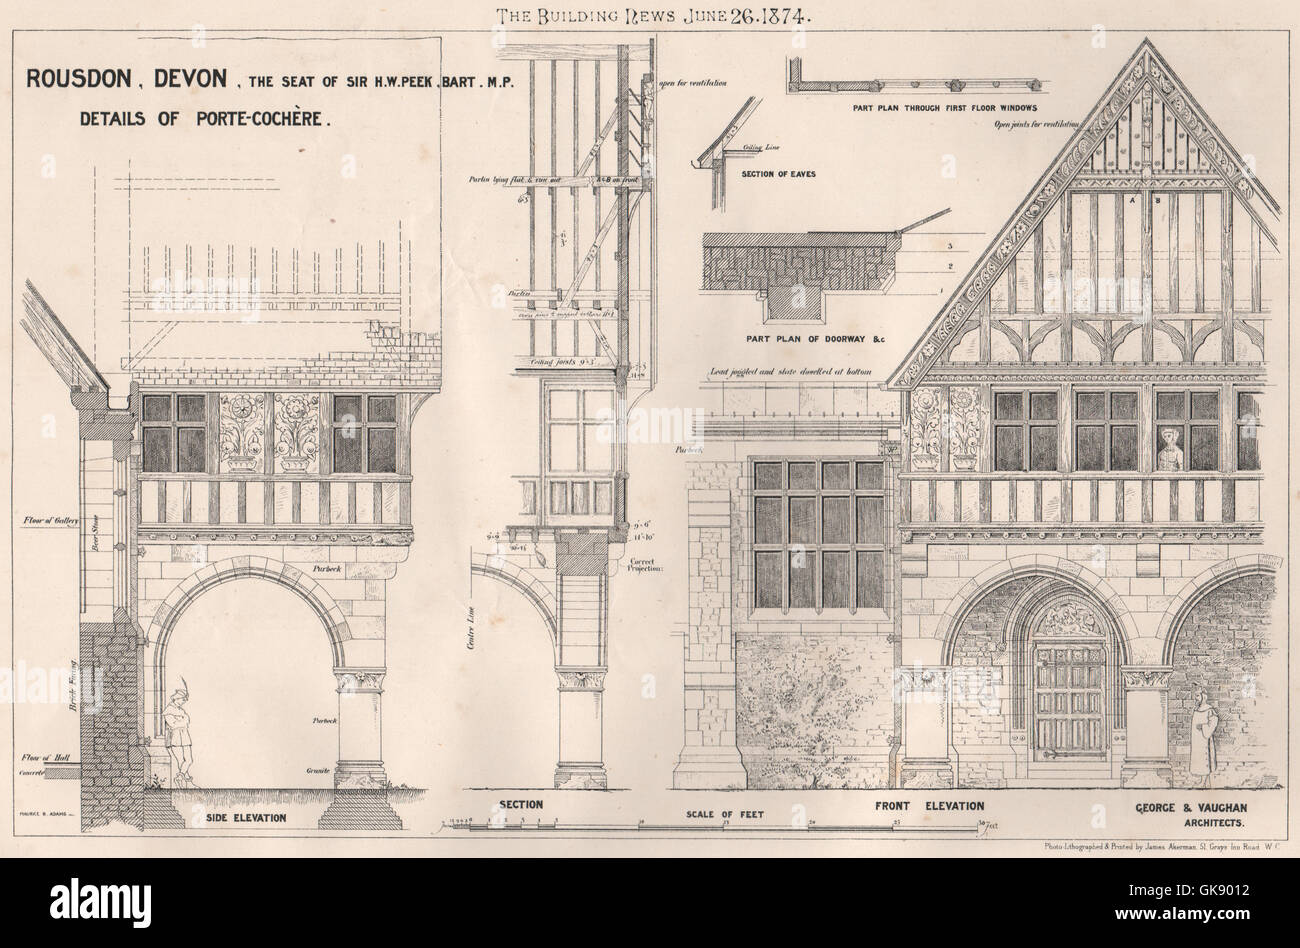 Rousdon, Devon (Sir HW Peek). Porte-Cochère; George & Vaughan Architects, 1874 - Stock Image